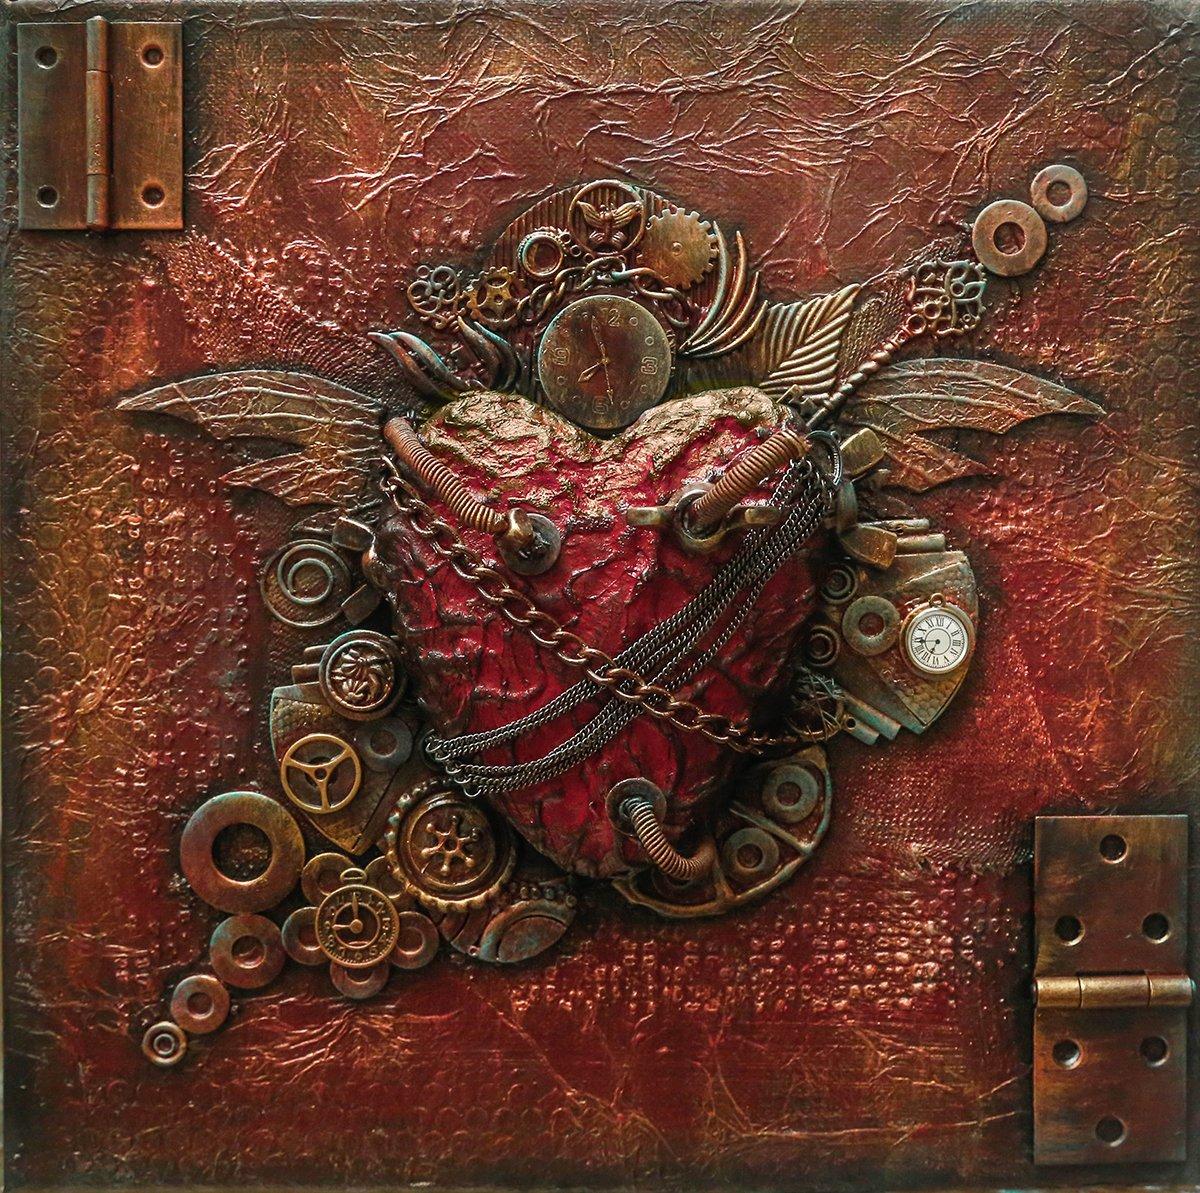 #art #steampunk  My mechanical heart.  https://t.co/Rh1JctD7Lu